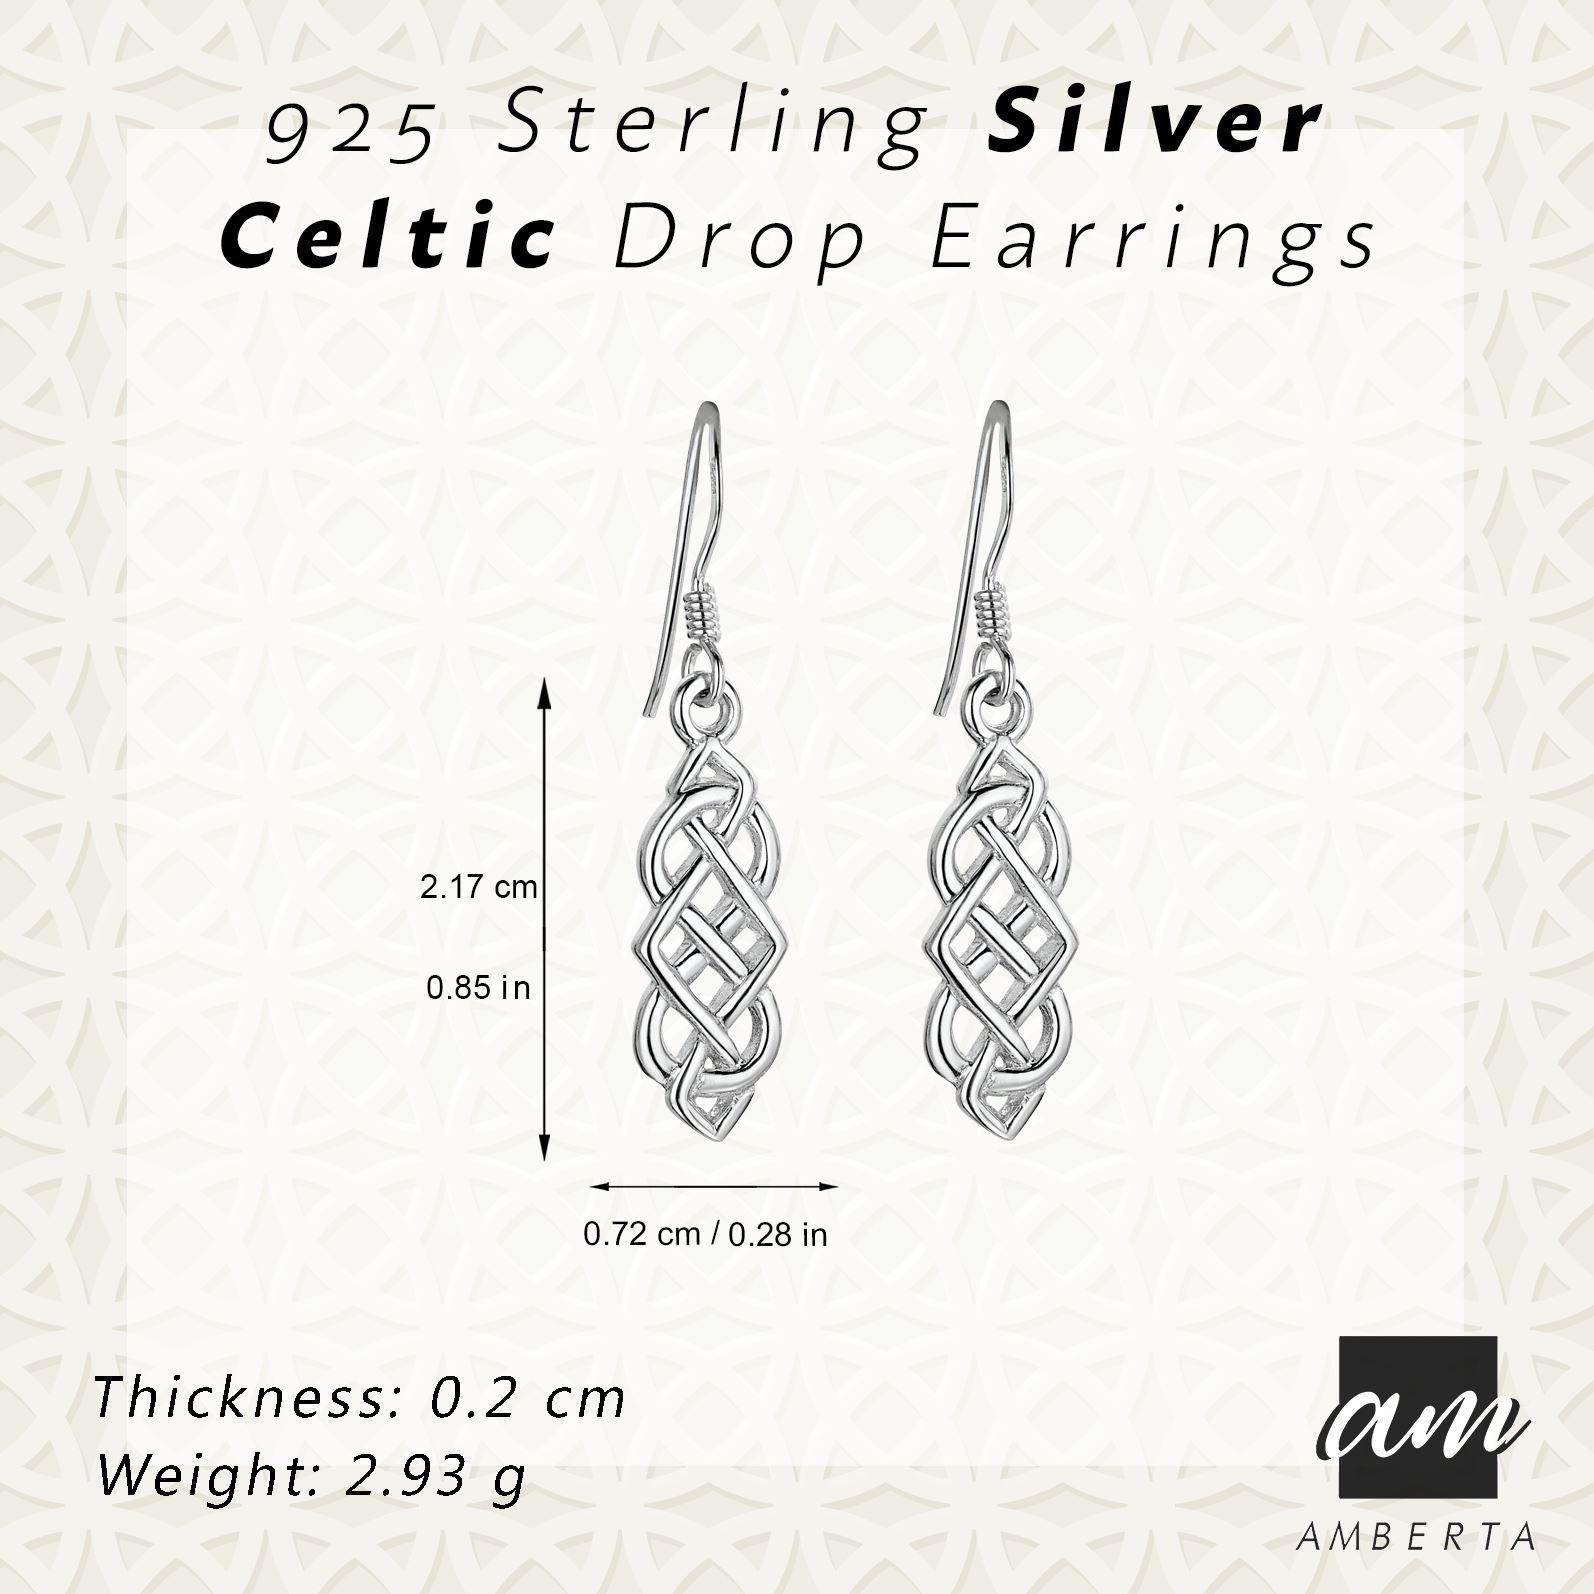 Amberta-925-Sterling-Silver-Celtic-Knot-Earrings-for-Women-Irish-Design miniature 27